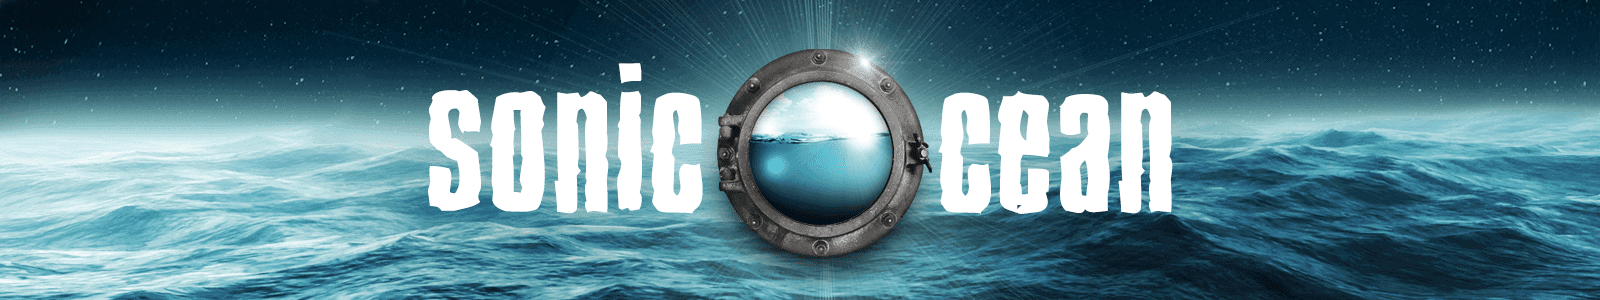 Sonic Ocean by Impact Soundworks (Kontakt VST, AU, AAX)